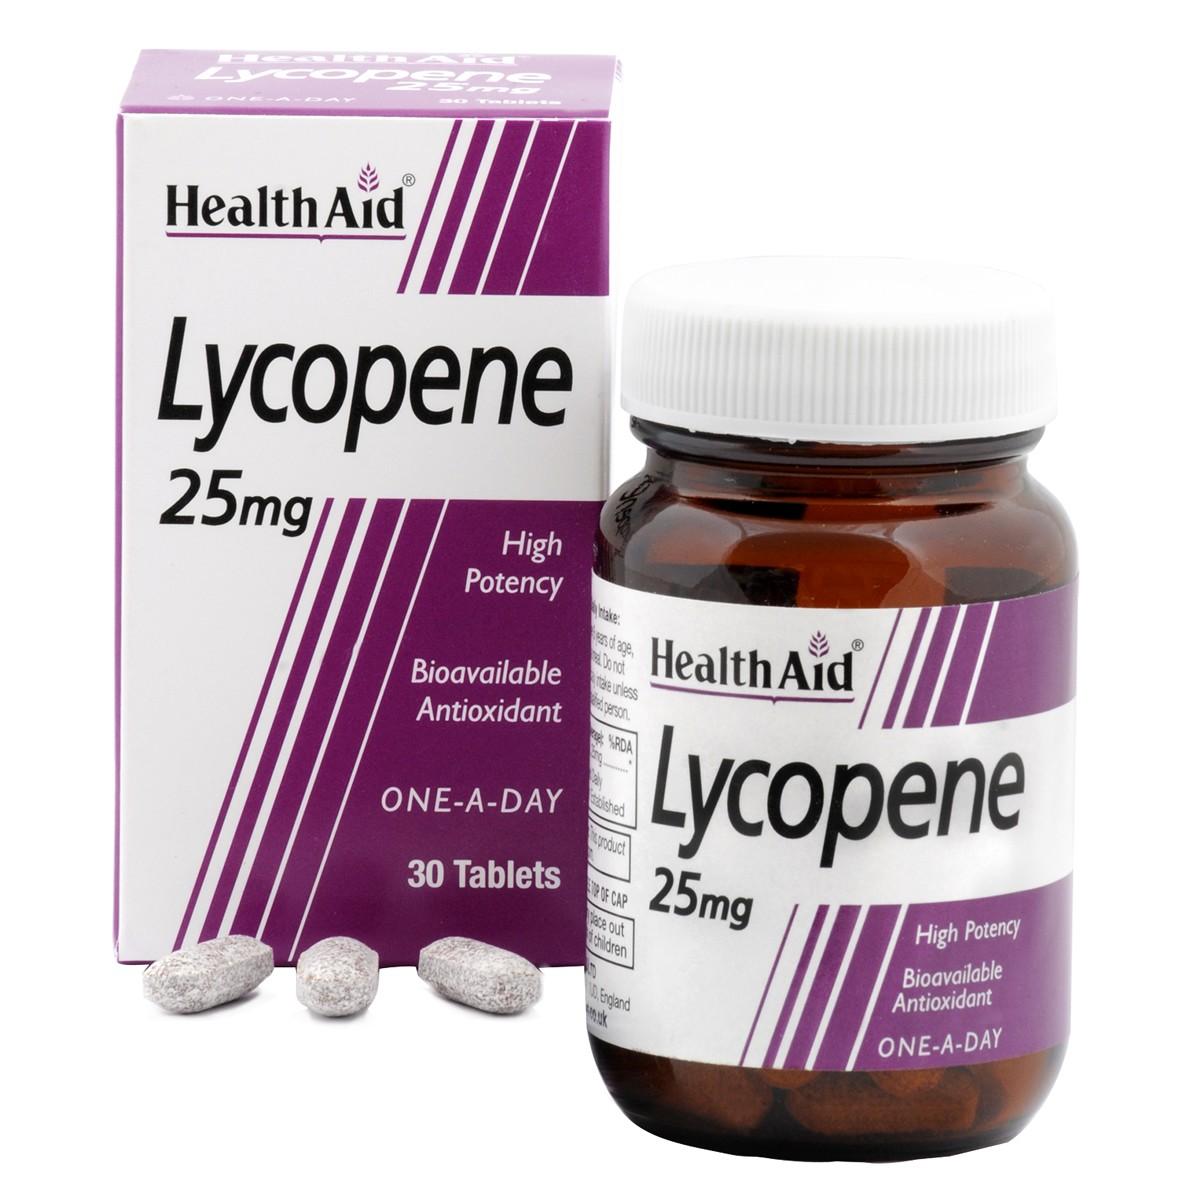 HealthAid Lycopene 25mg